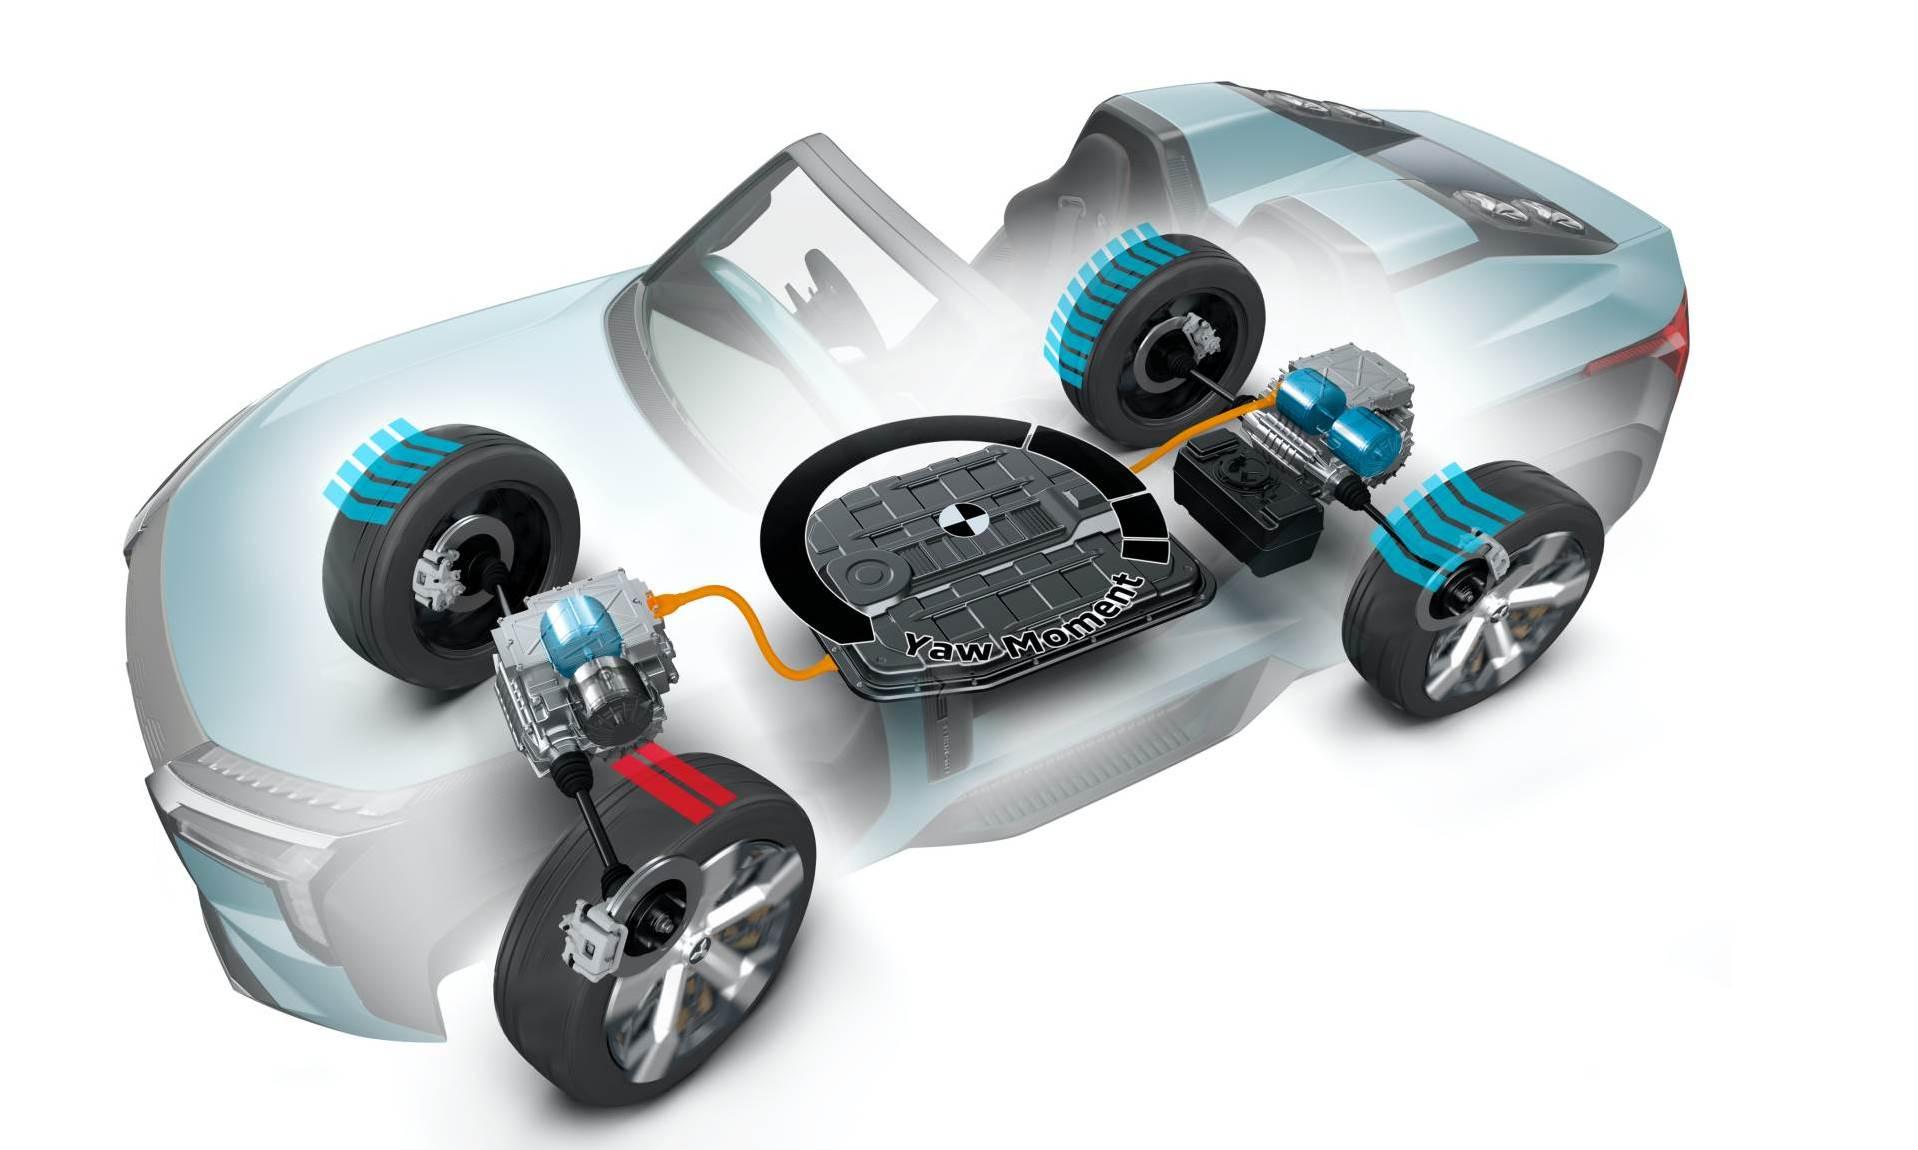 Mitsubishi MI-Tech Concept drivetrain